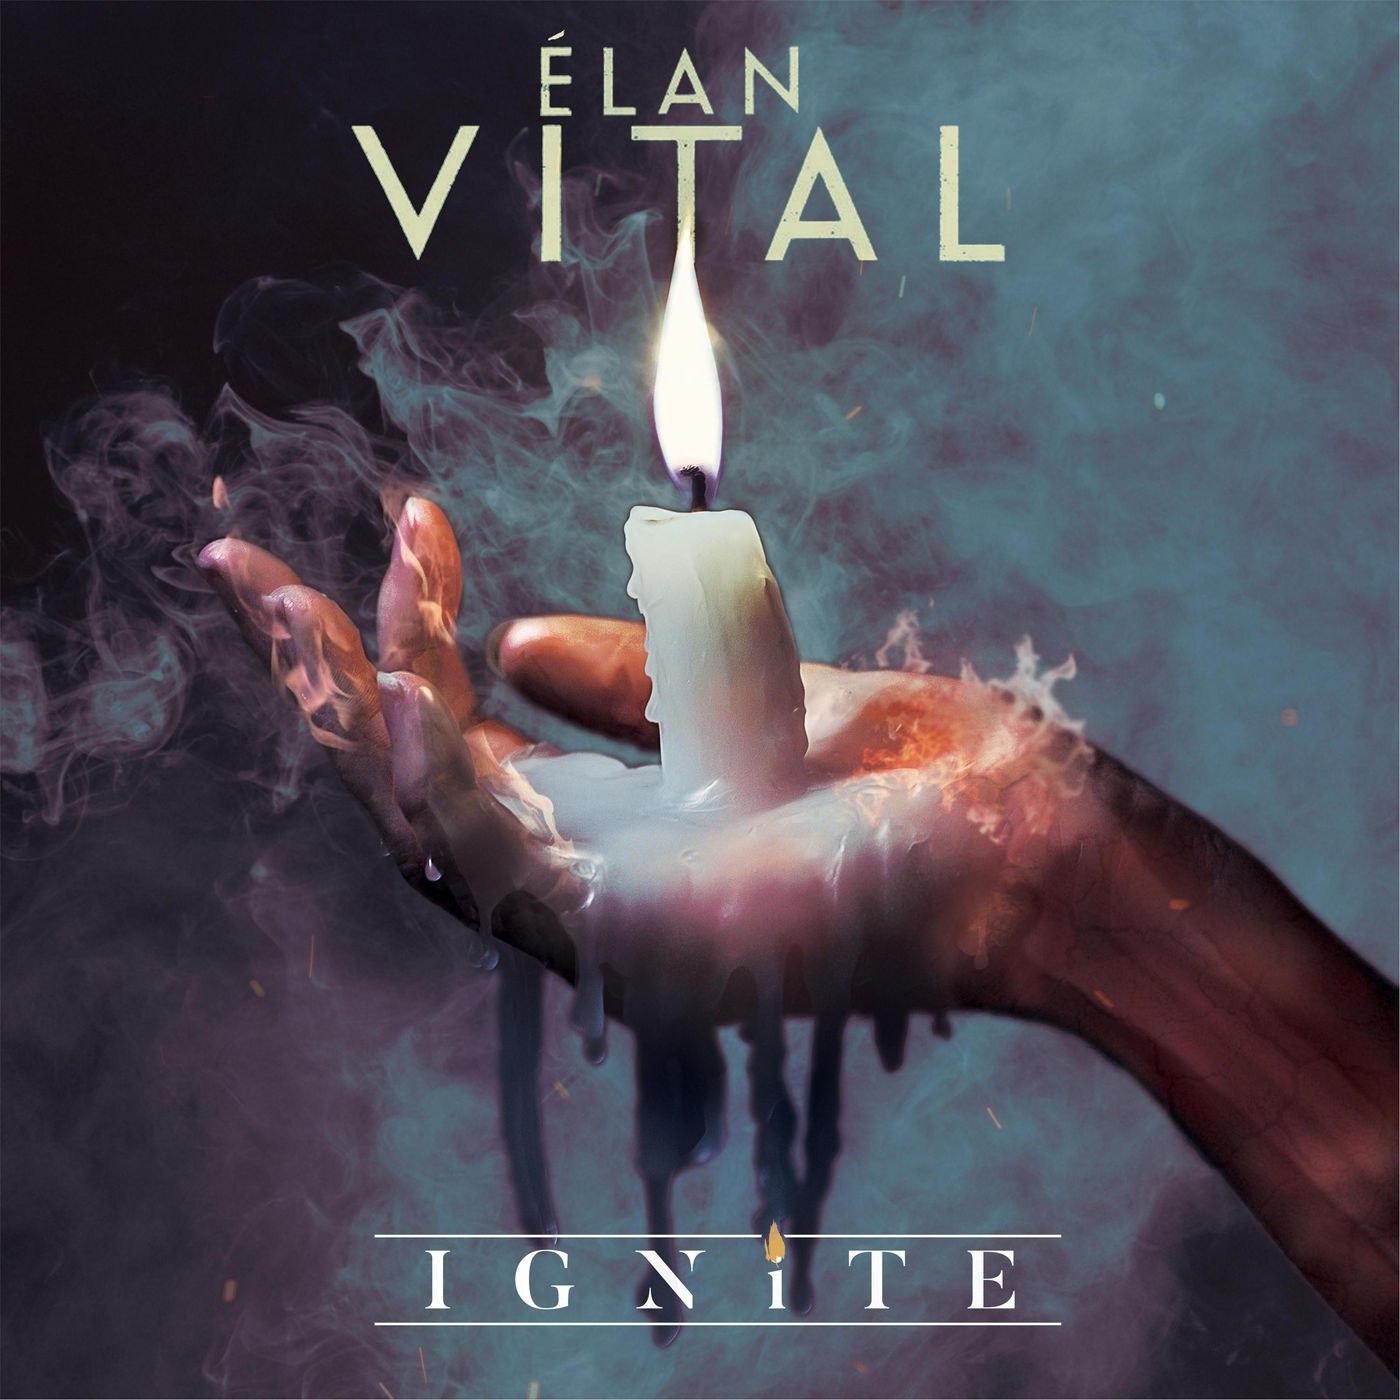 Élan Vital - Ignite [EP] (2017)